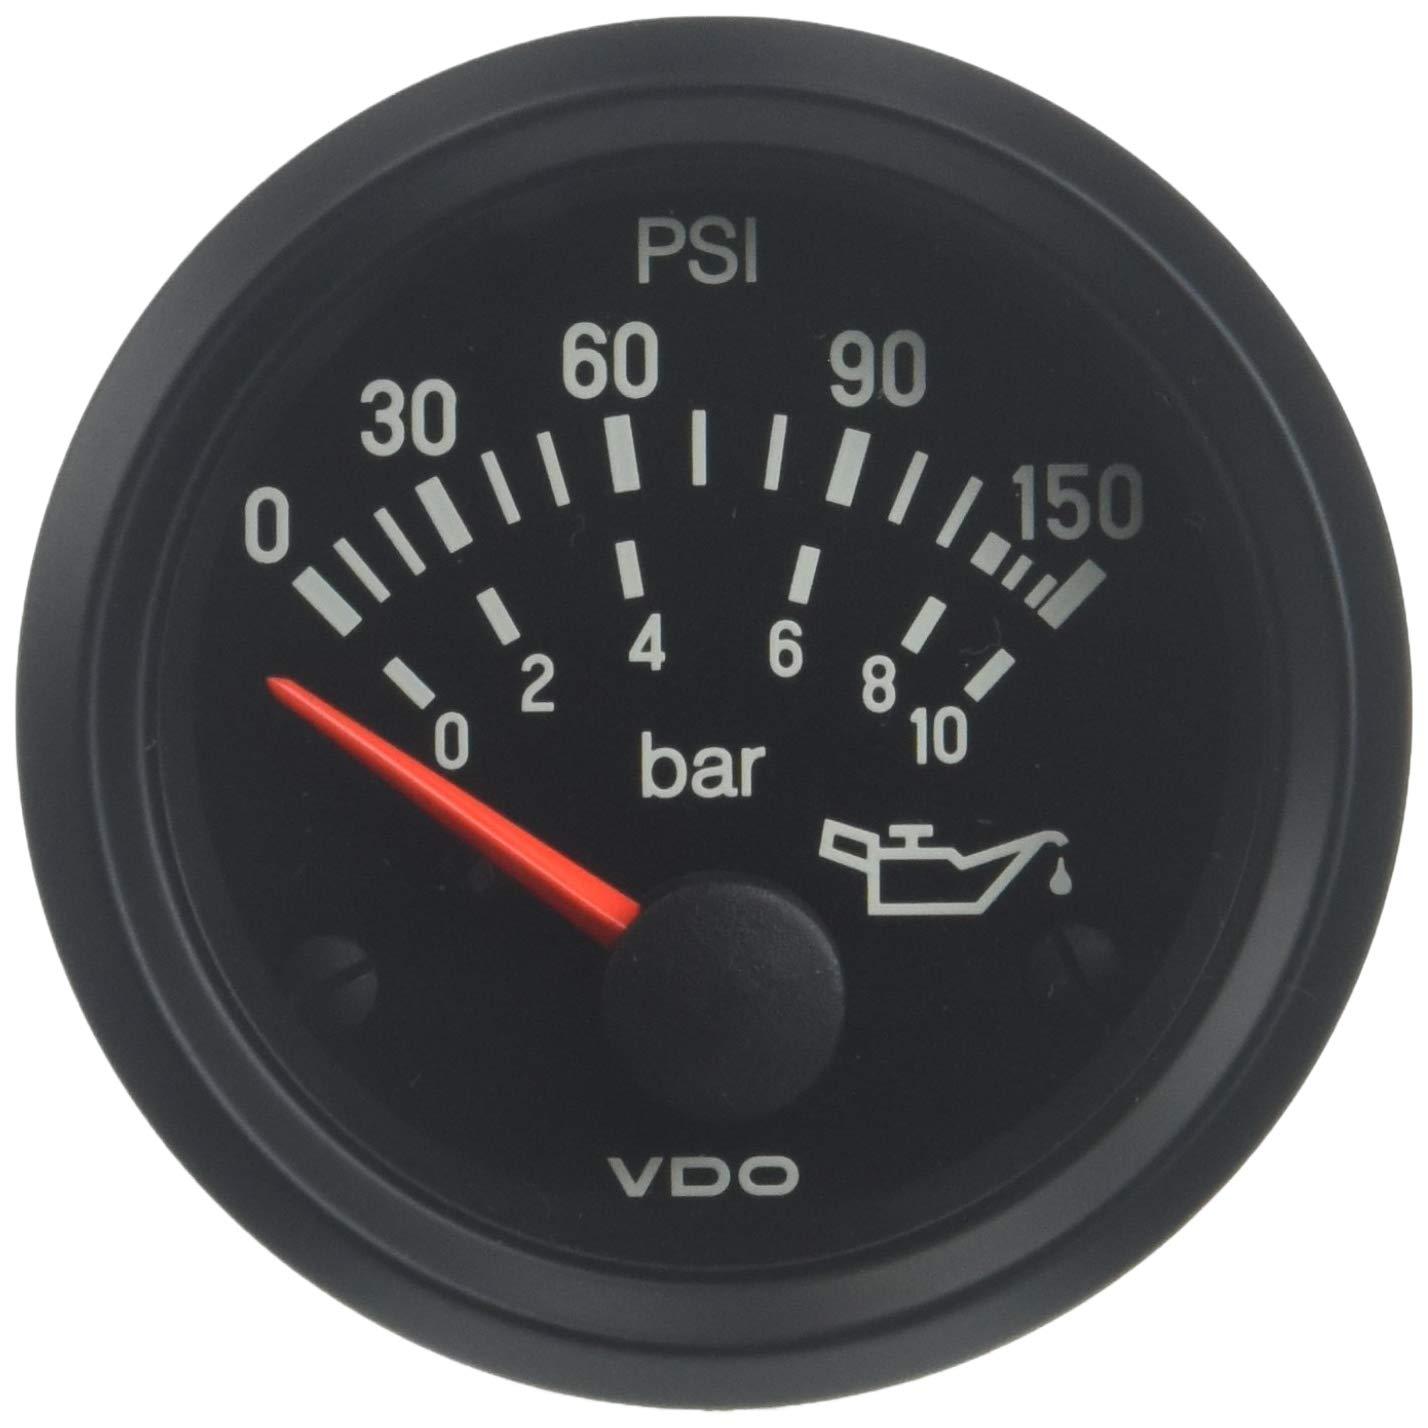 VDO 350 910 Oil Pressure Gauge by VDO